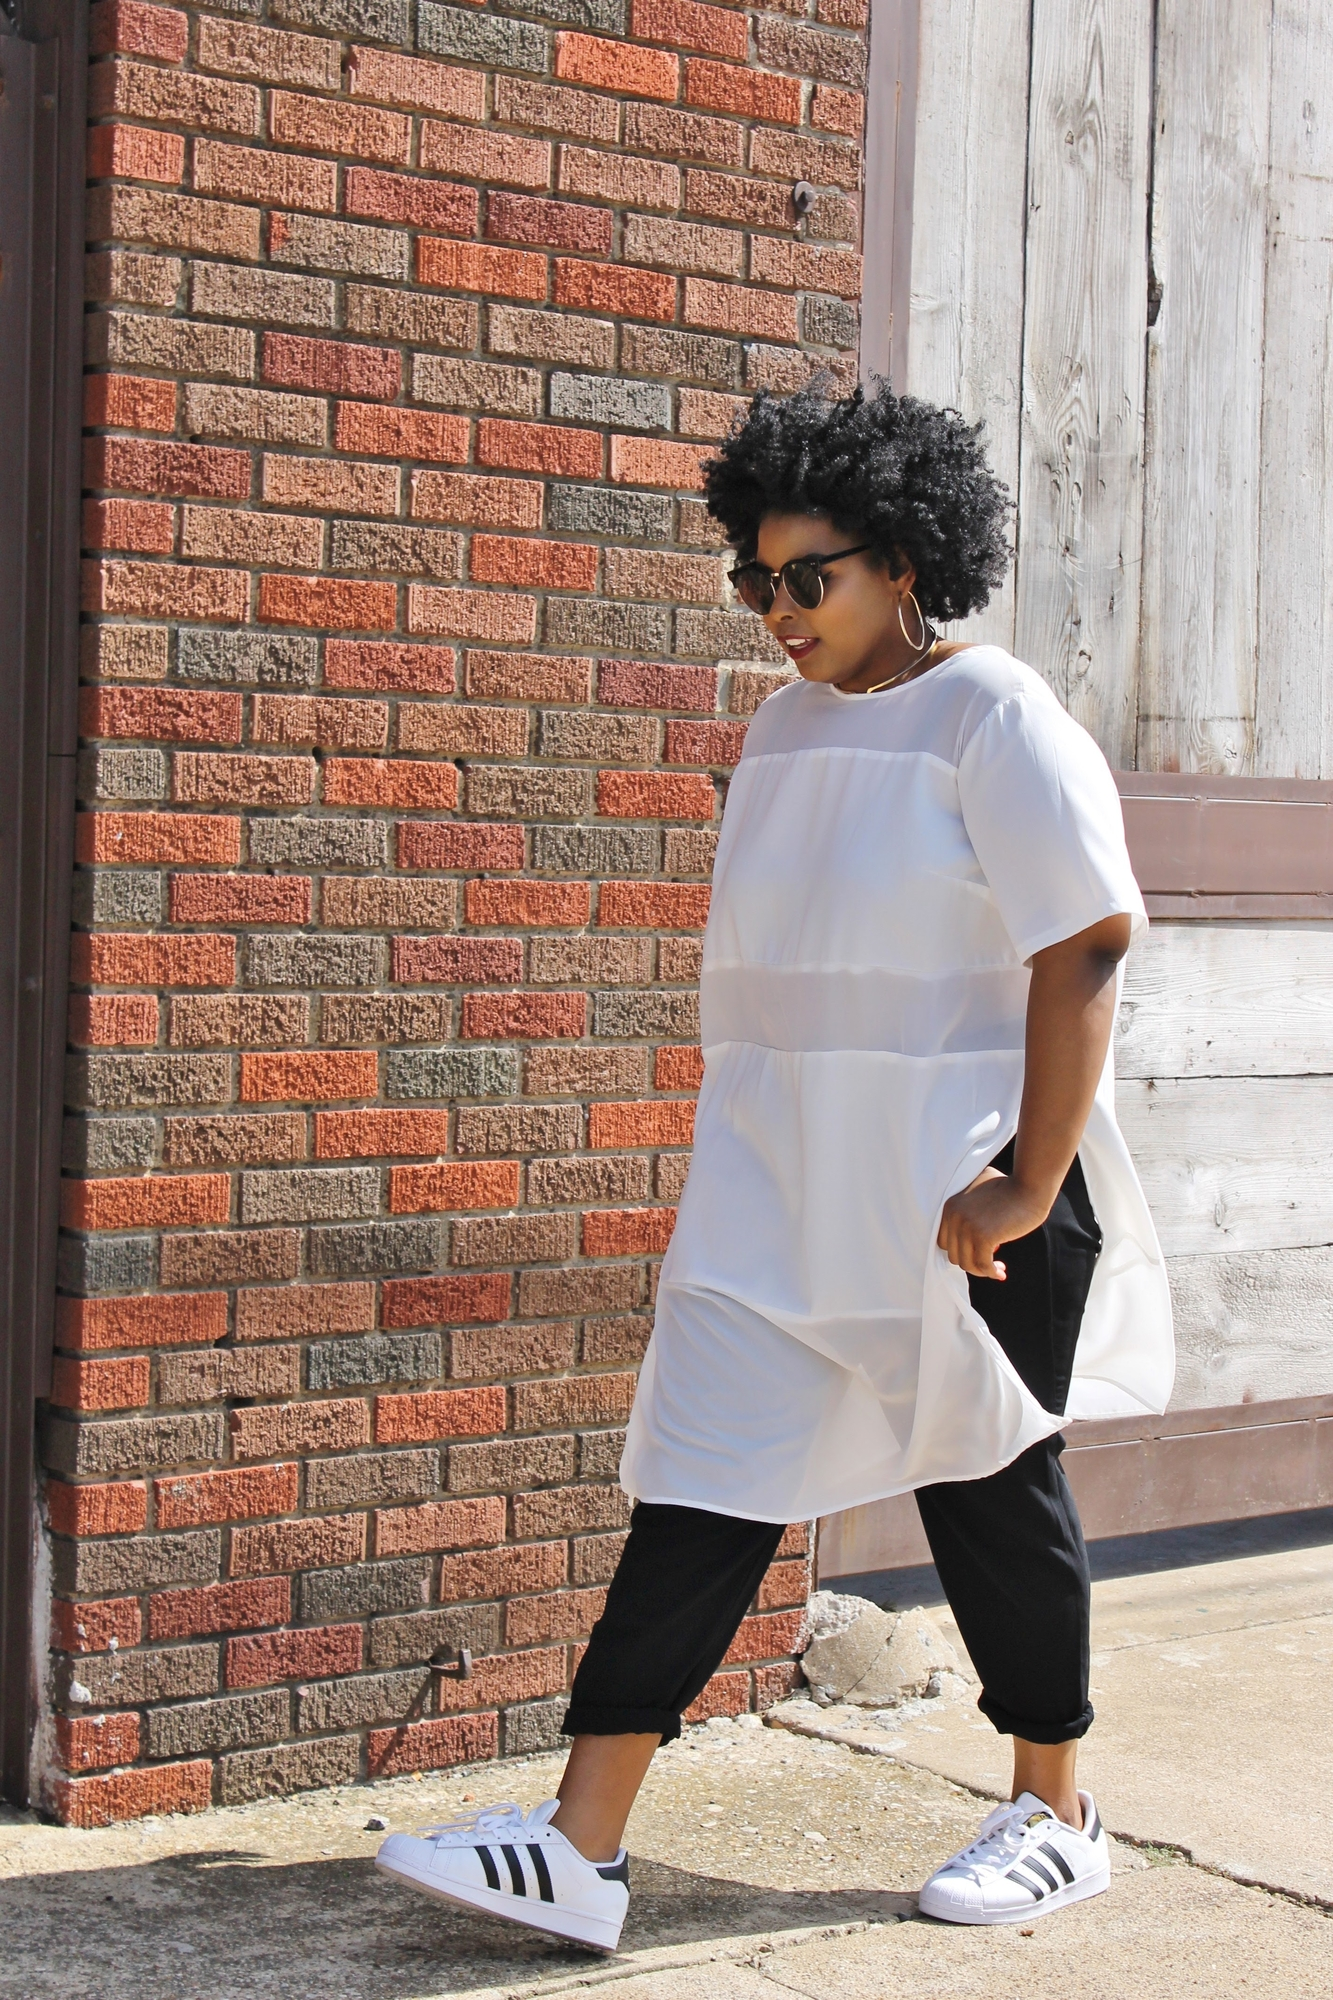 fashion influencer walking by brick wall